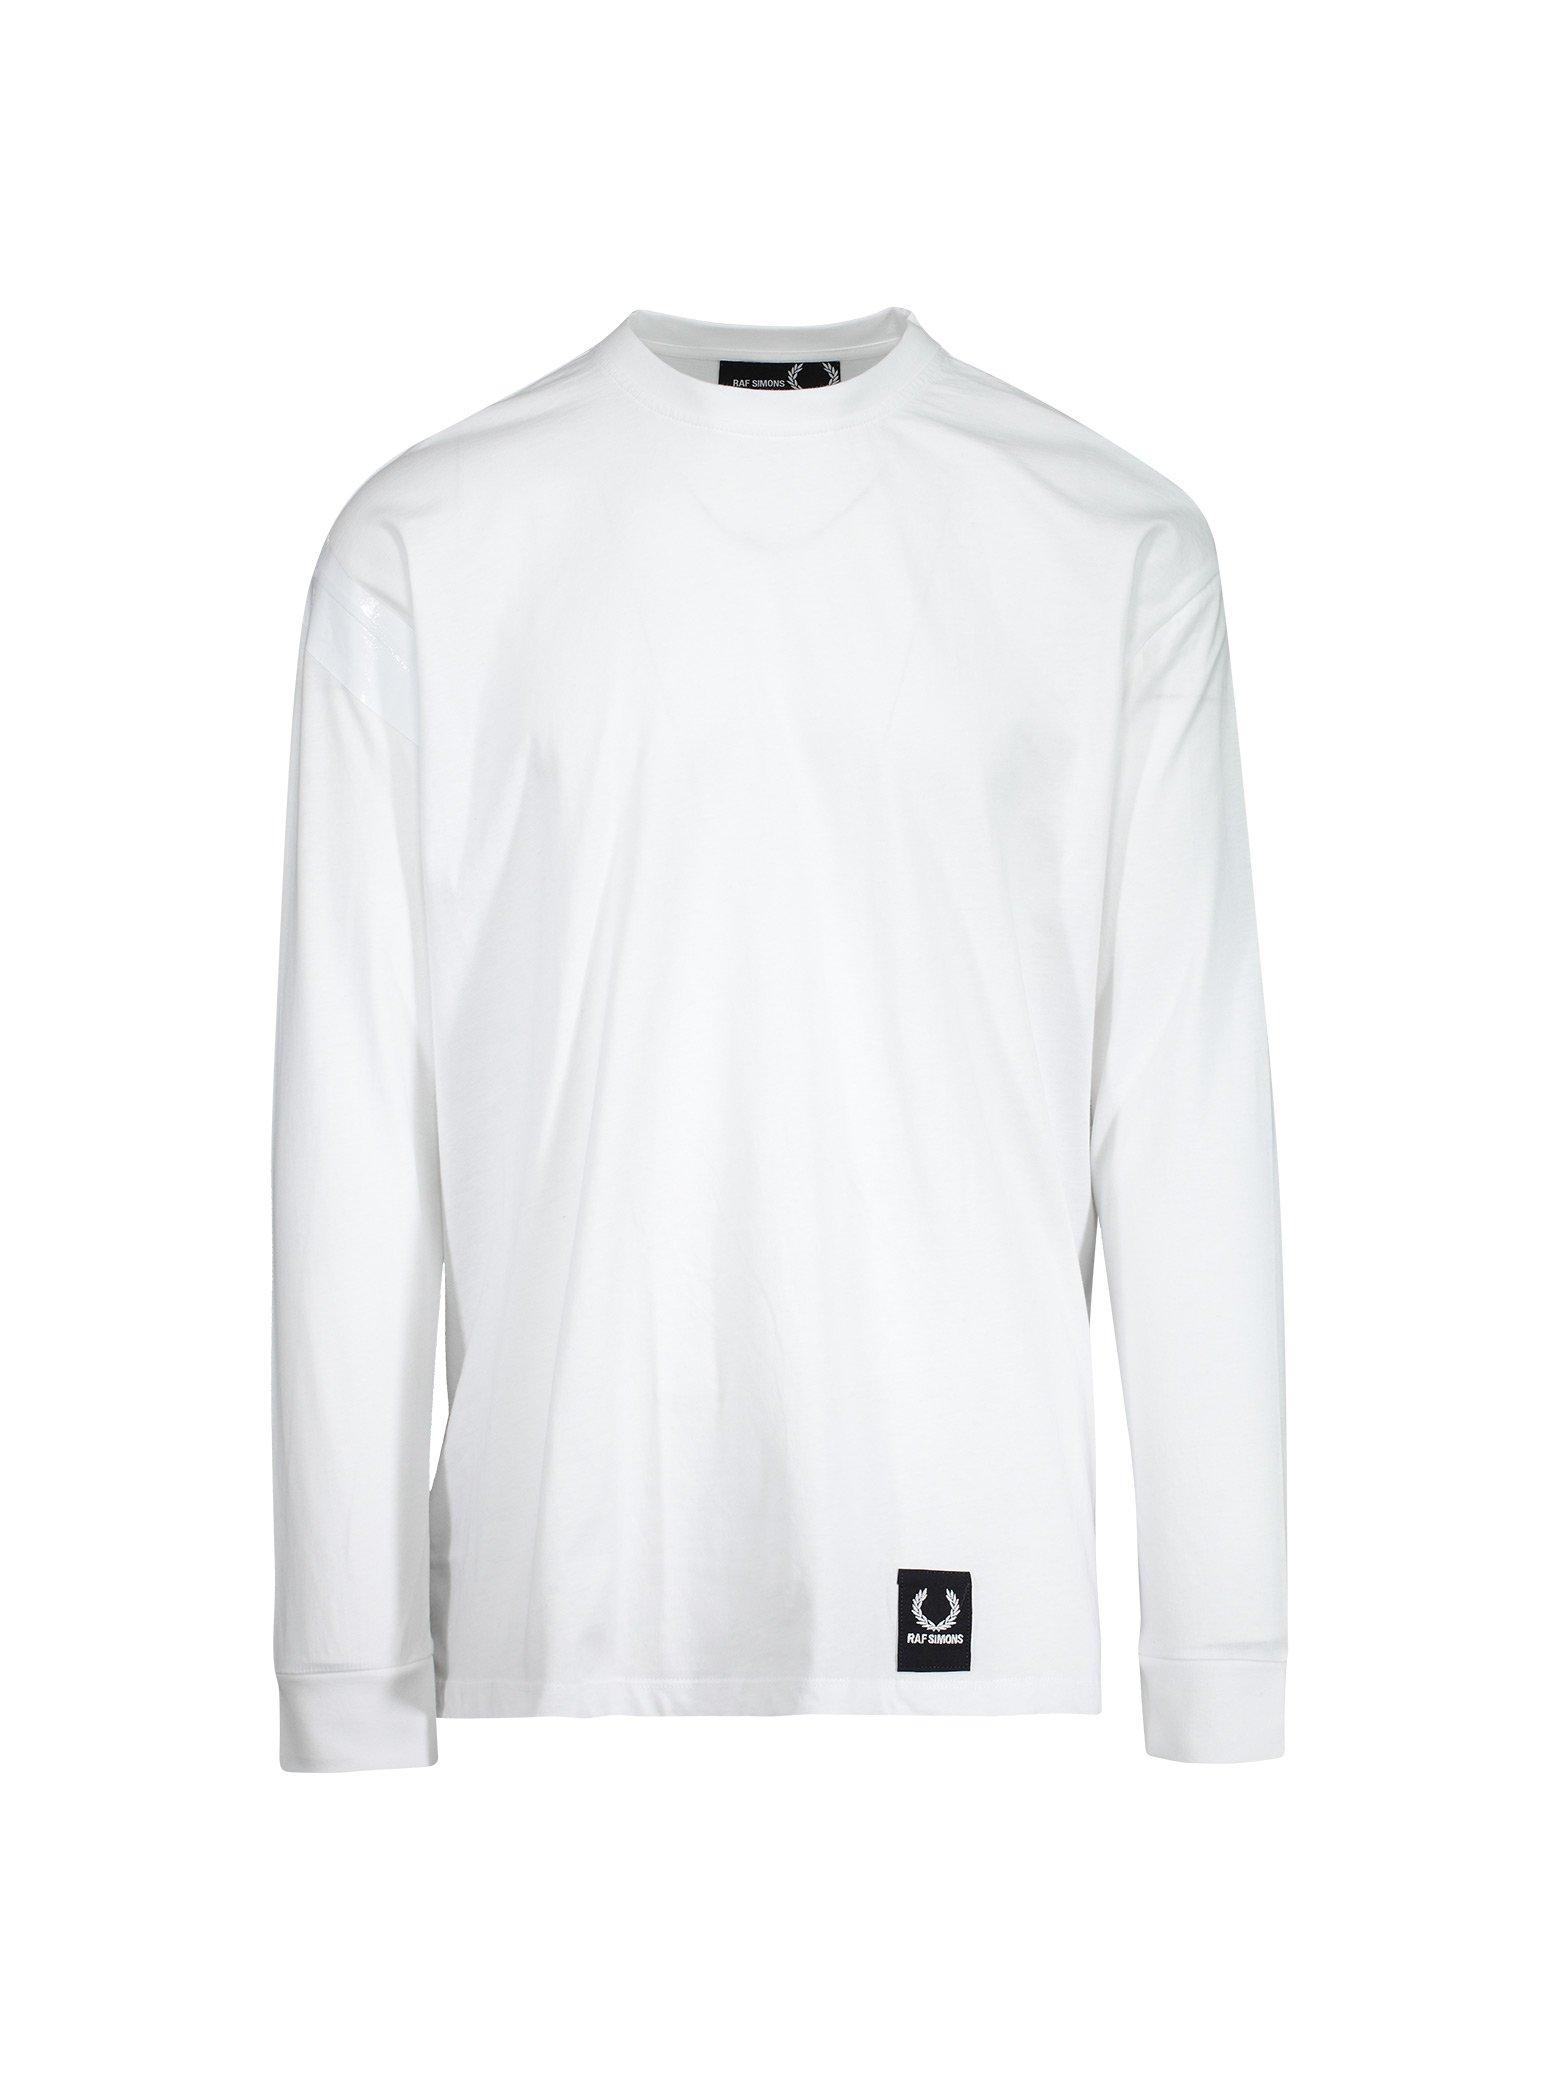 8f7f1e9b9d51 Raf Simons X Fred Perry Long Sleeve Tape Detail T-Shirt - White ...